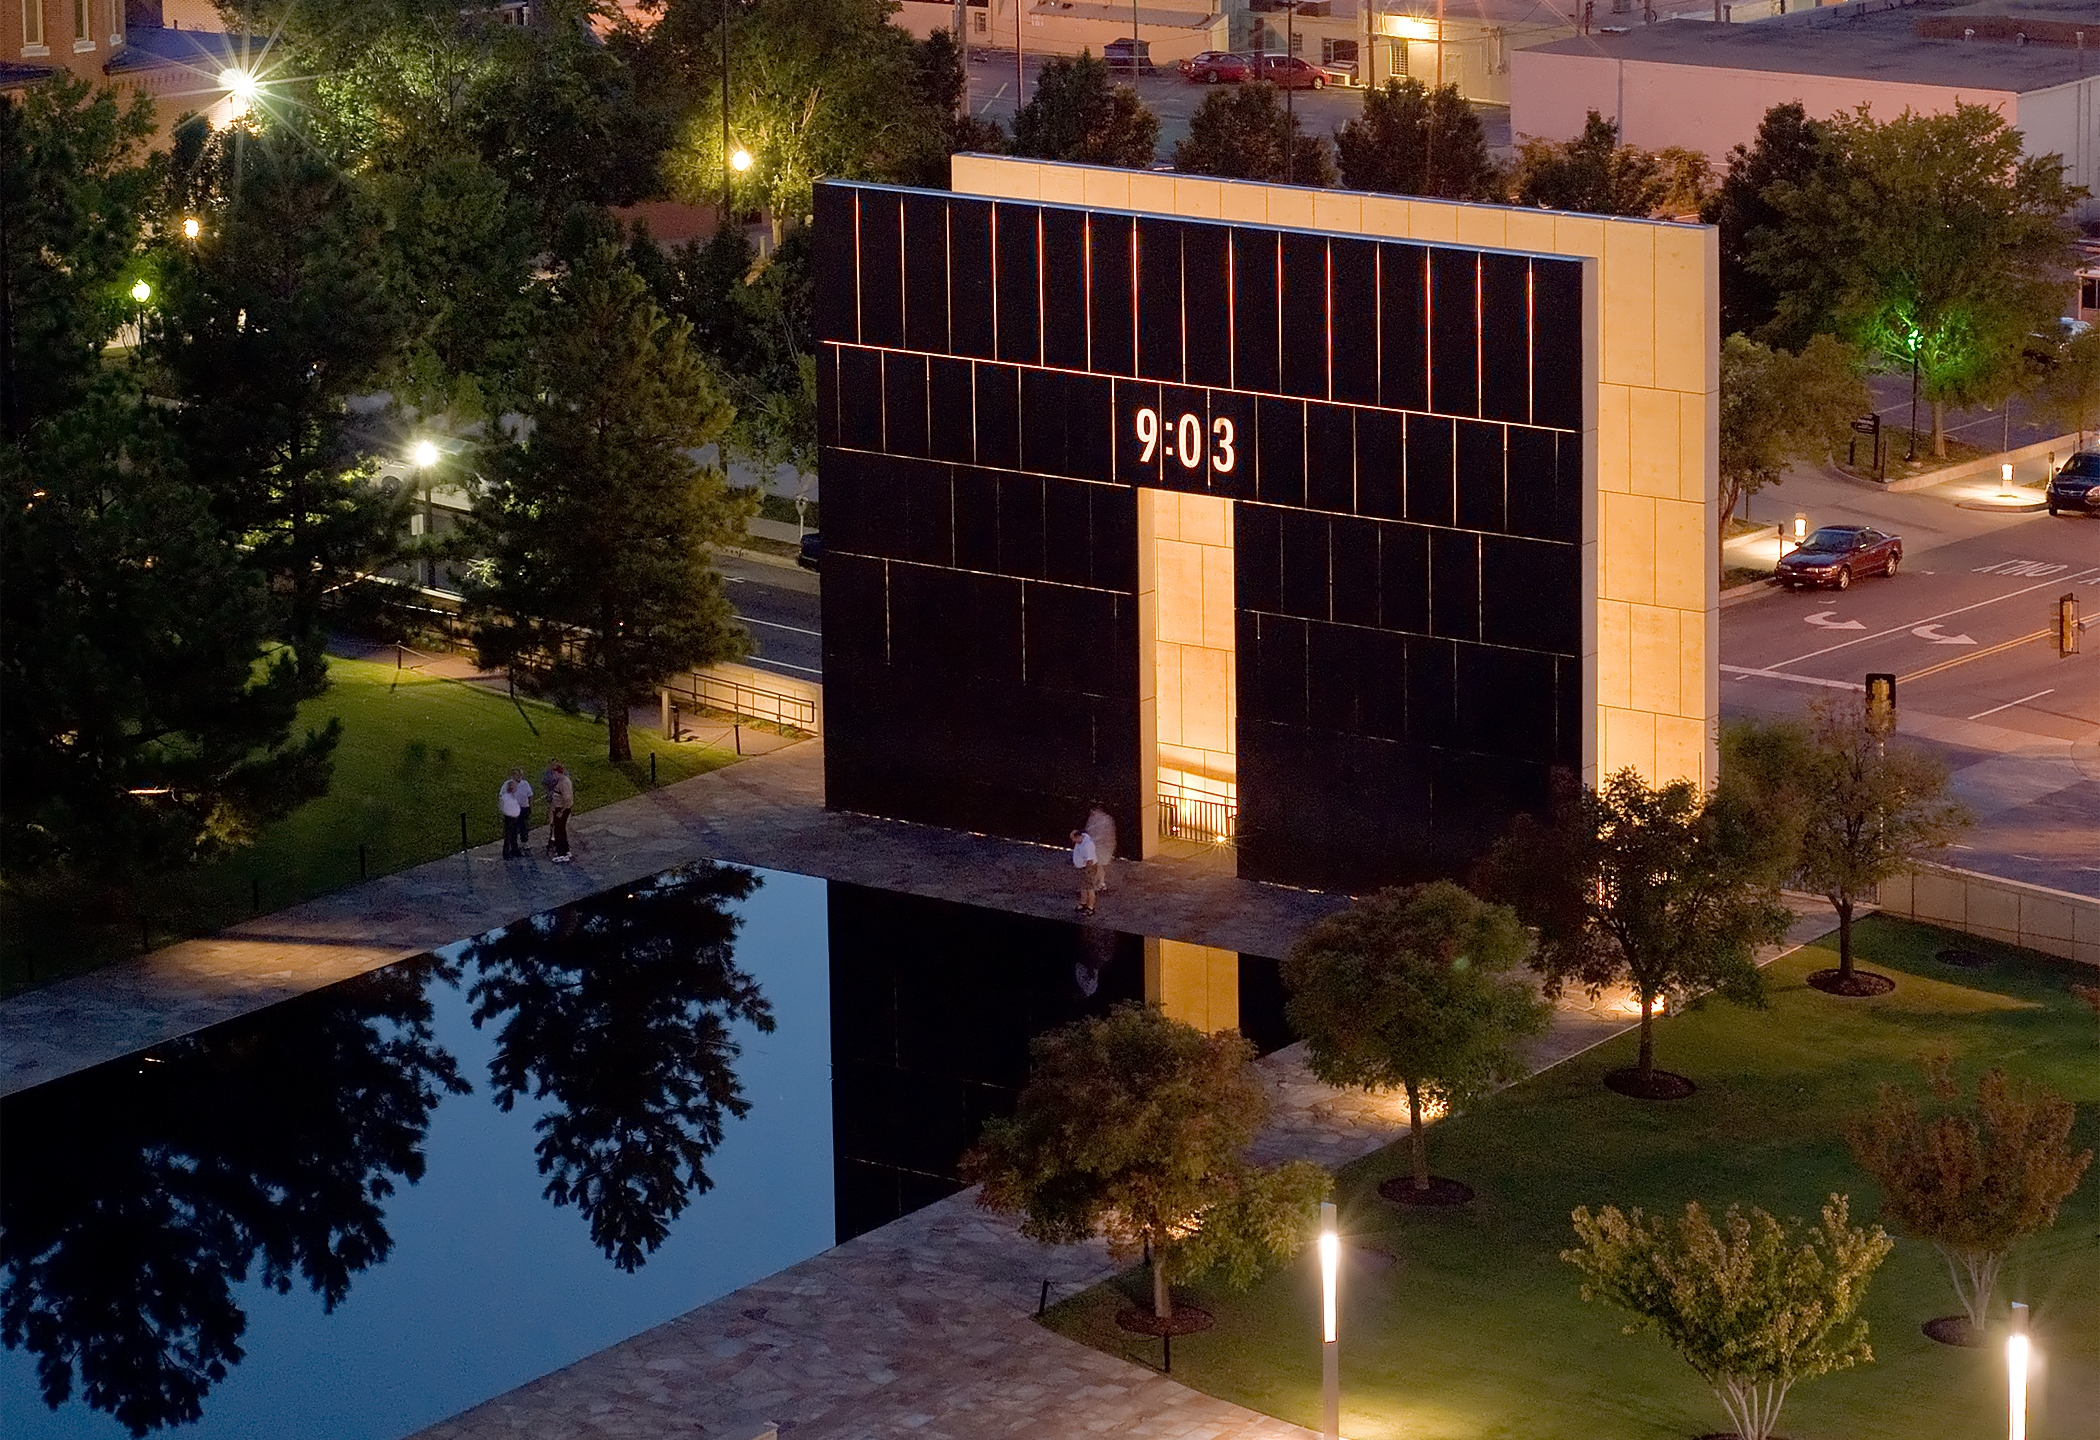 image of the okc national memorial museum